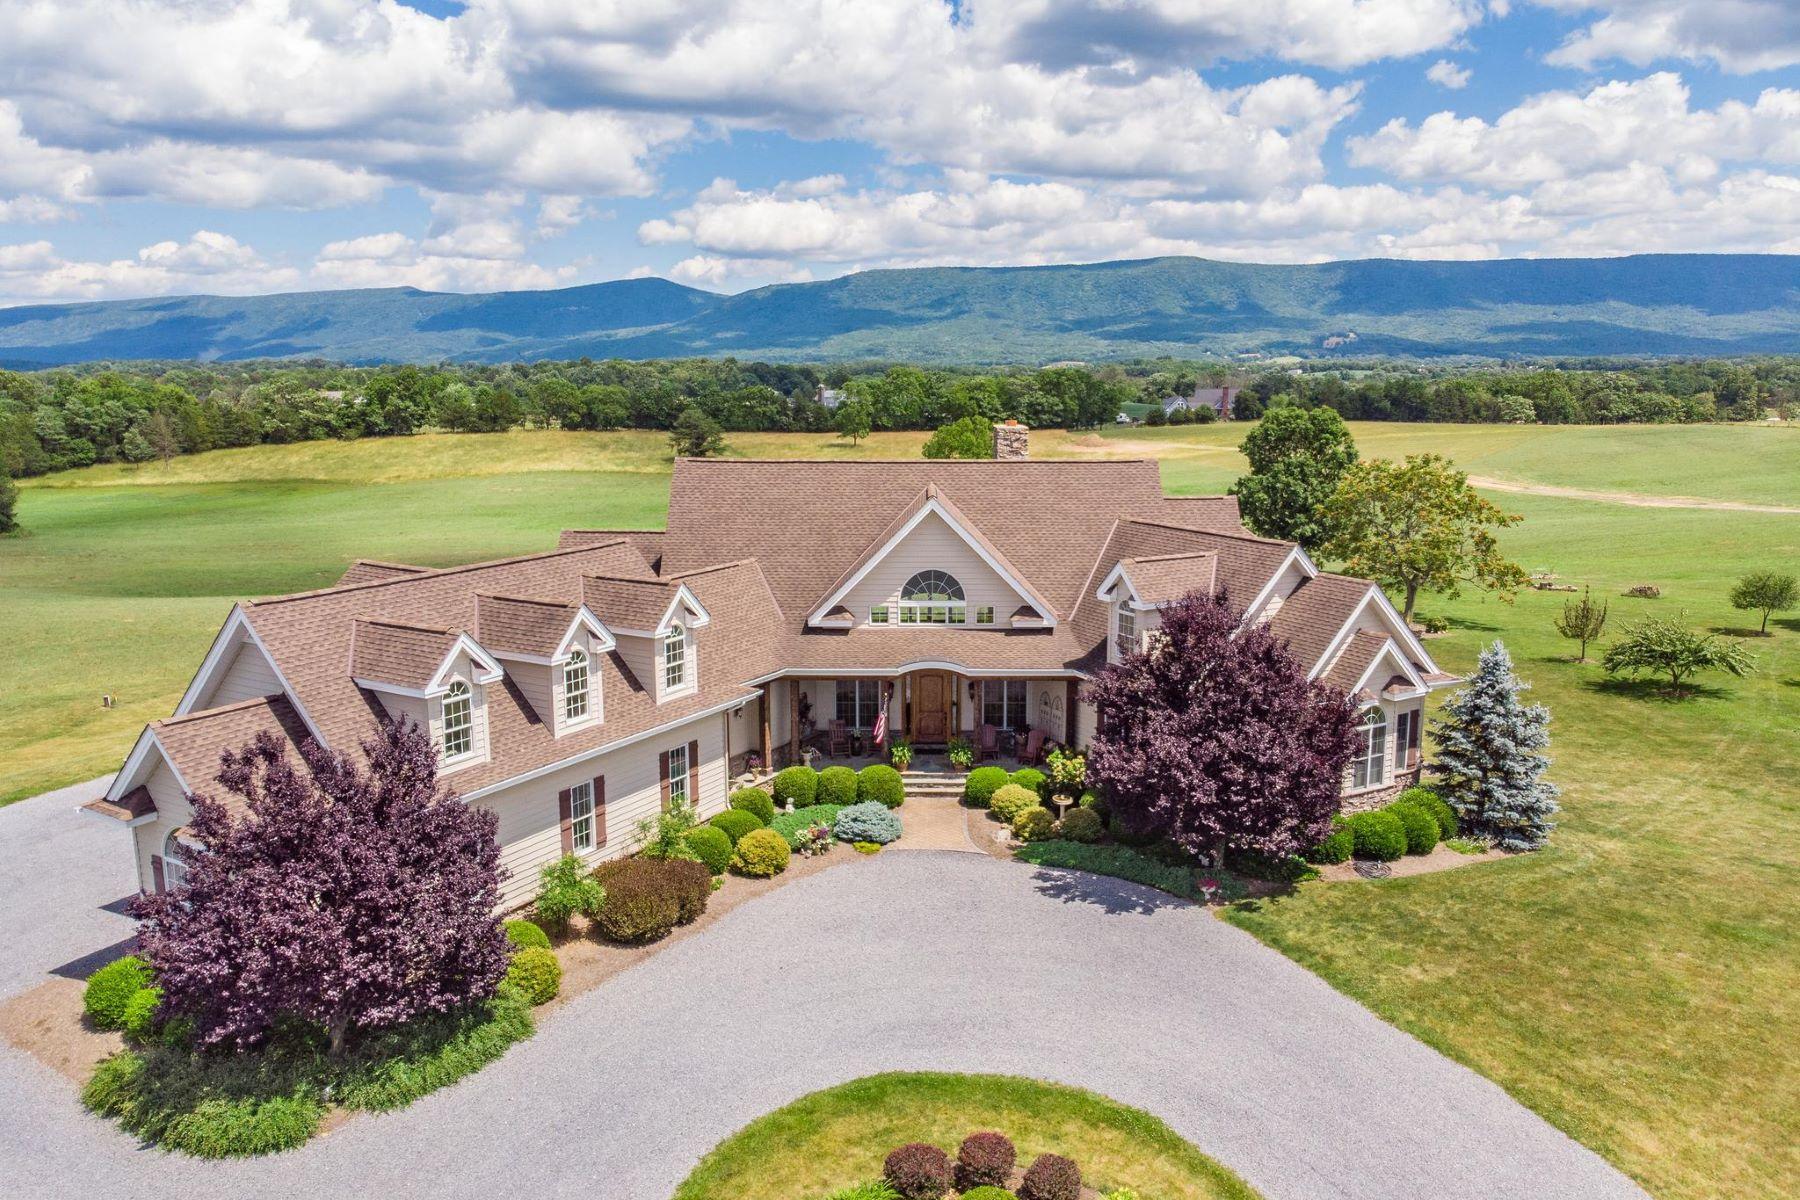 Single Family Homes for Active at 1809 Polk Rd Edinburg, Virginia 22824 United States